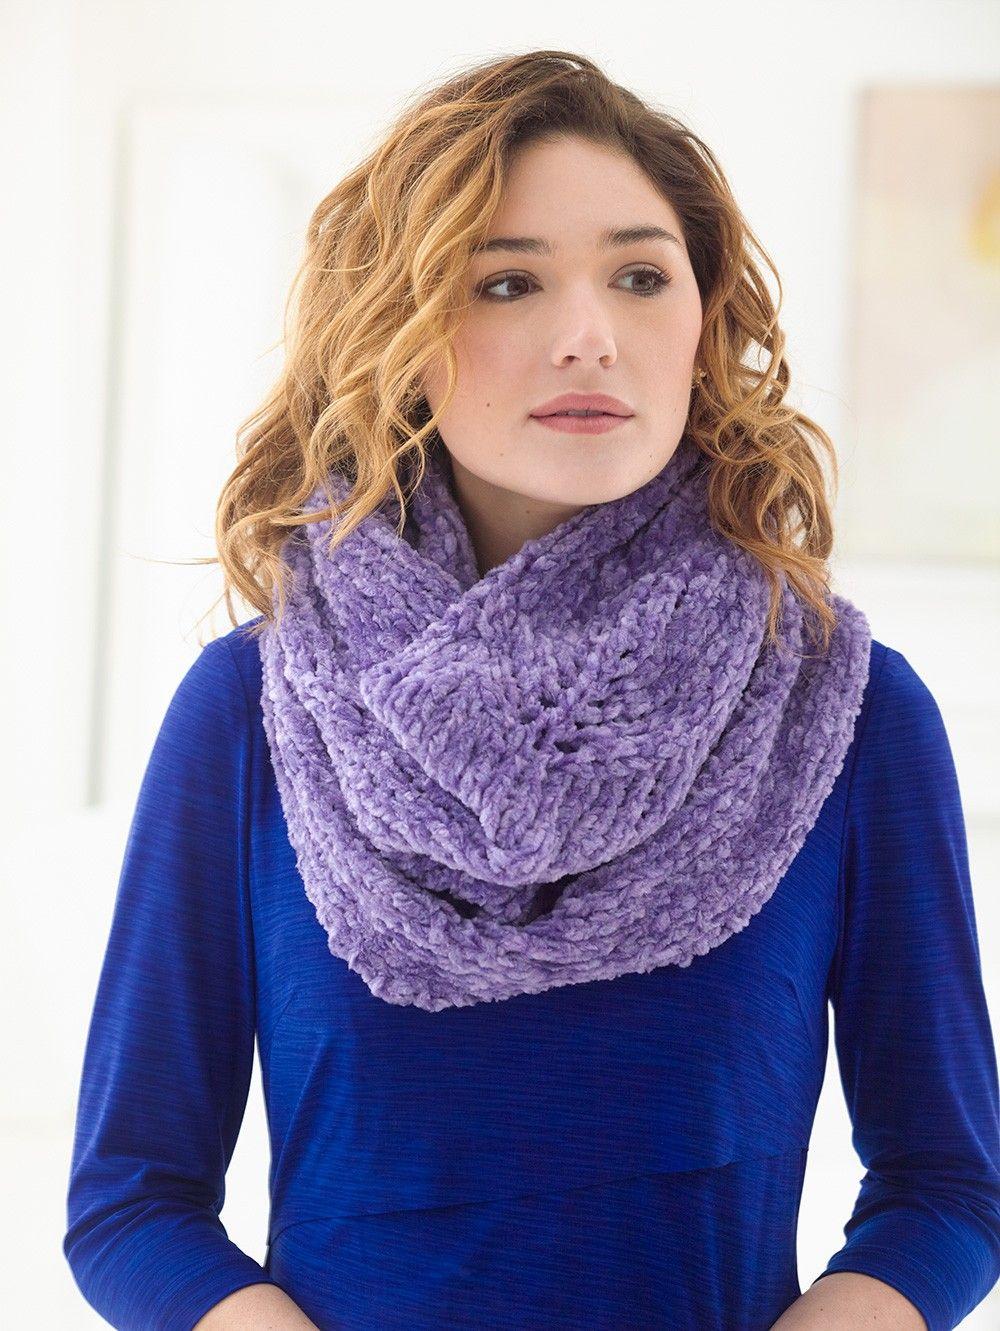 Chenille Lace Cowl Pattern - Patterns - Lion Brand Yarn | knit it ...